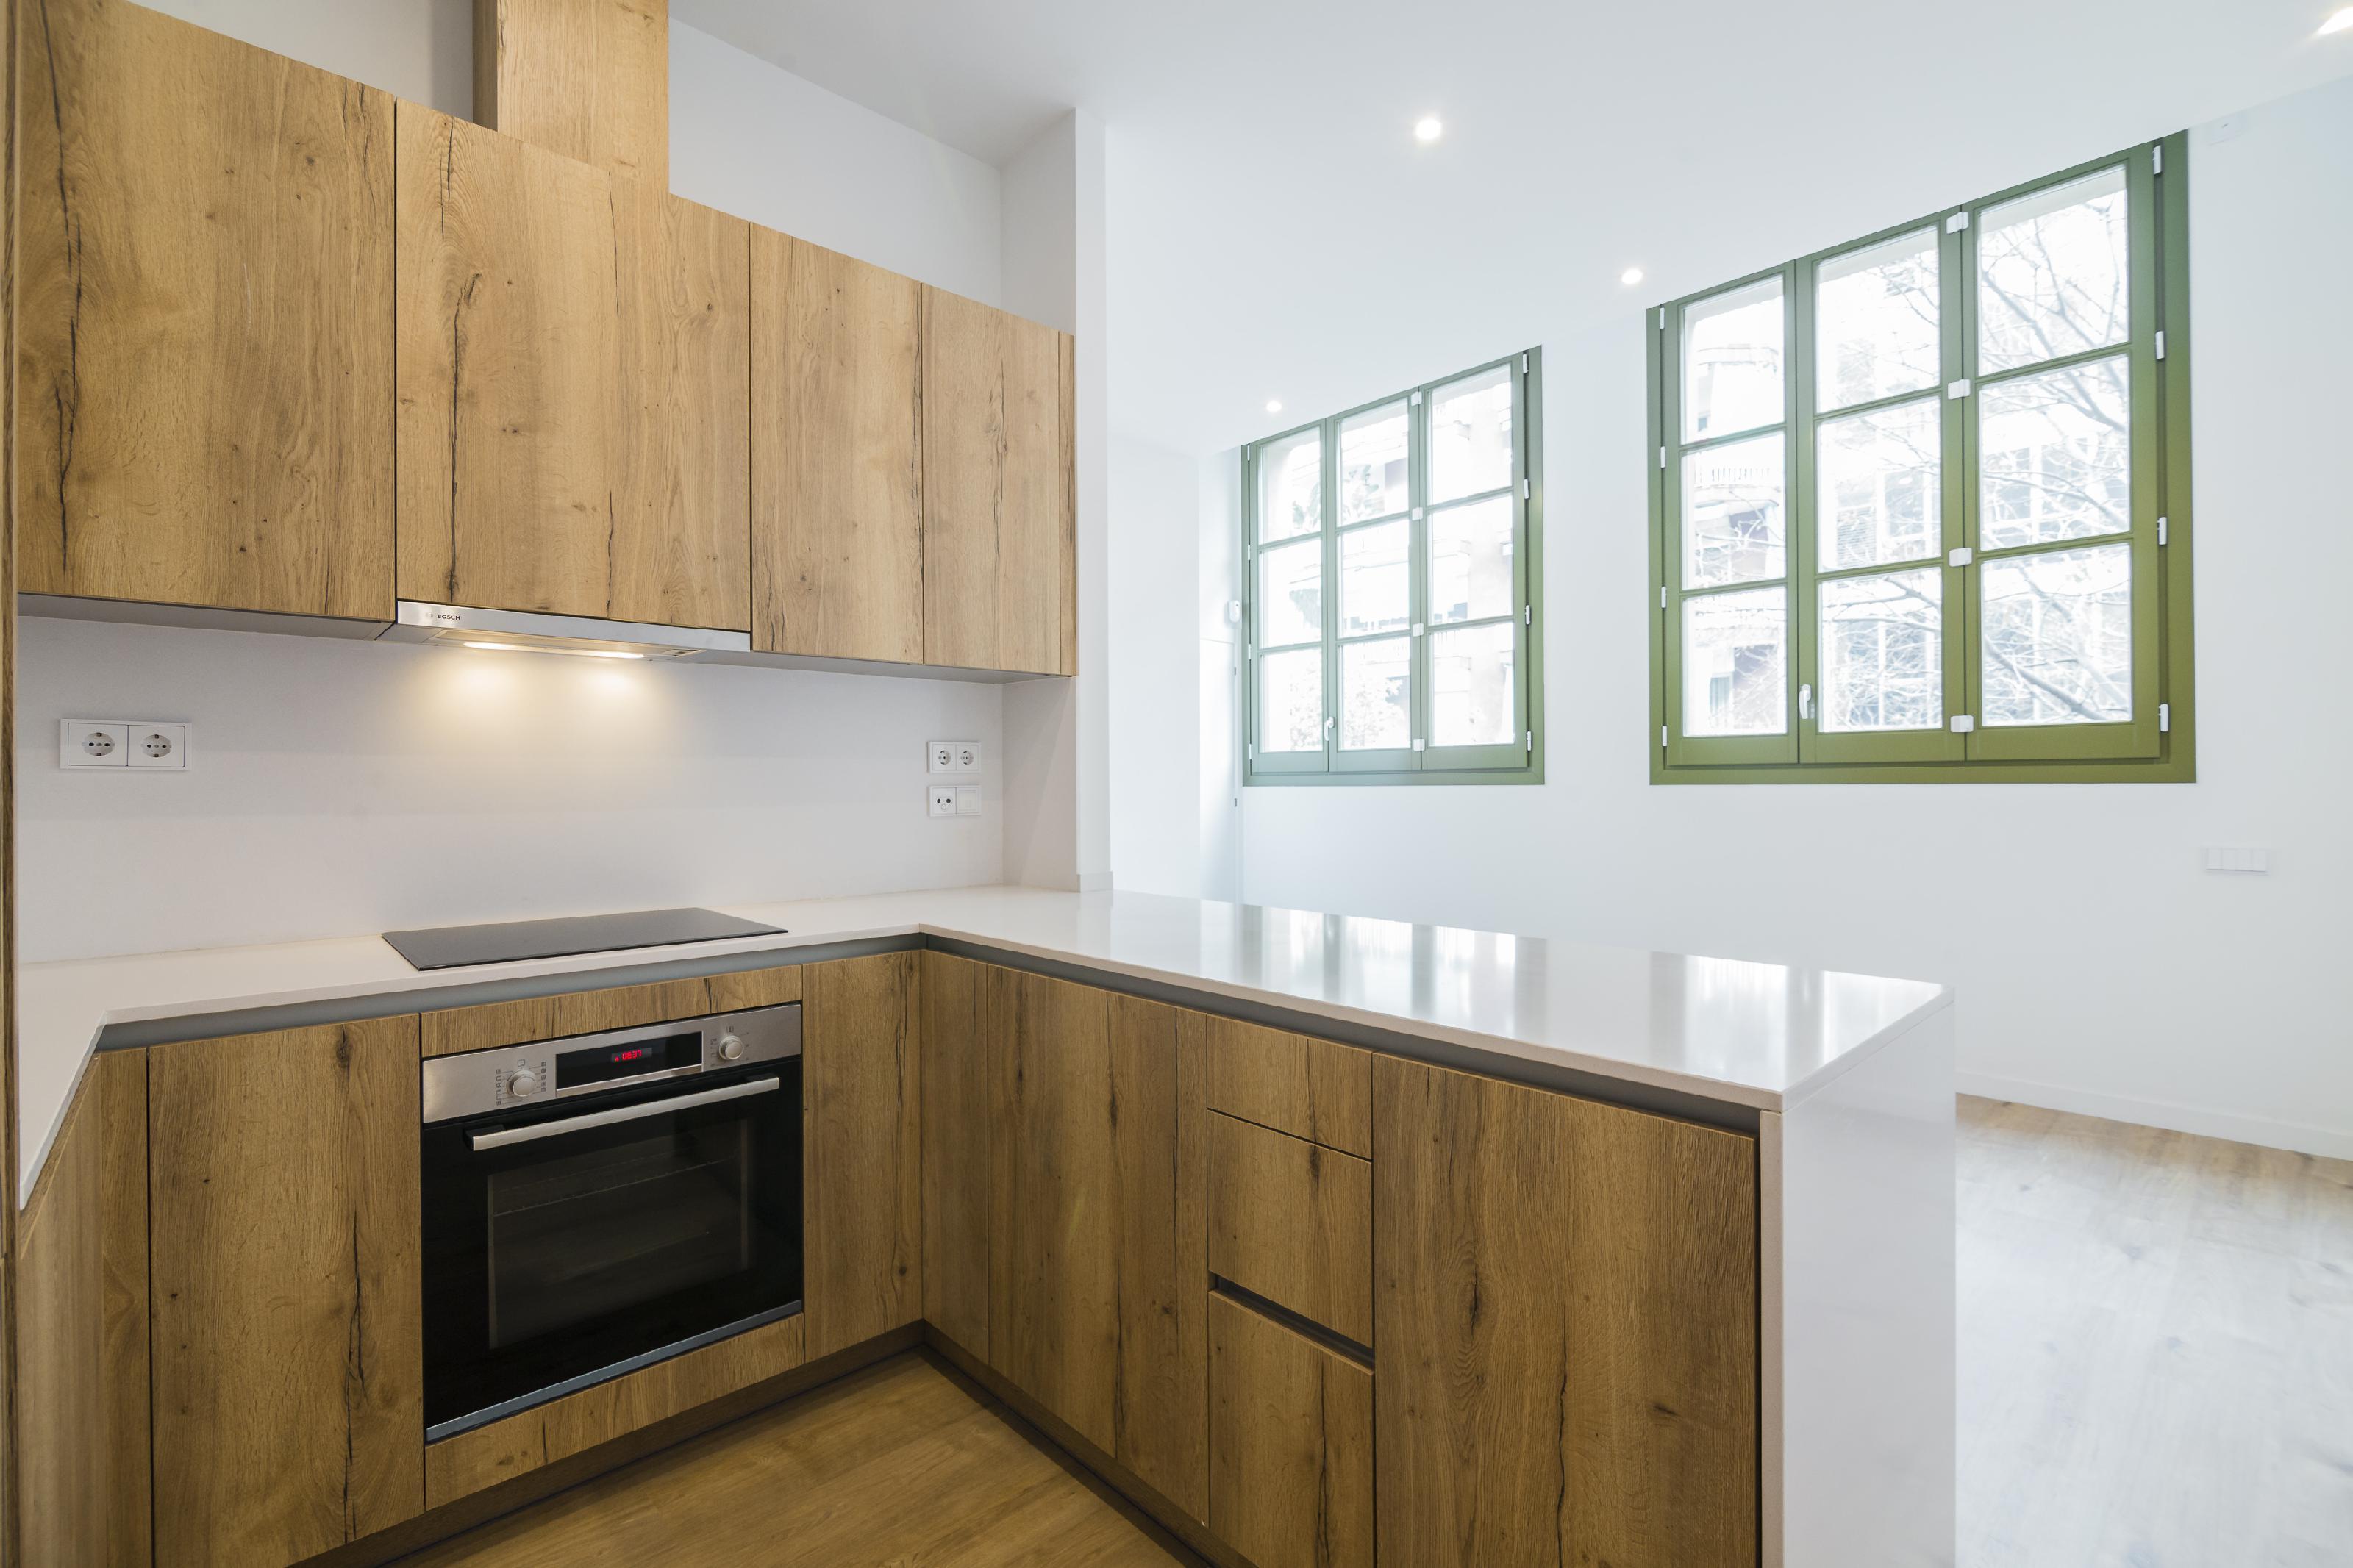 249266 Flat for sale in Eixample, Nova Esquerra Eixample 9